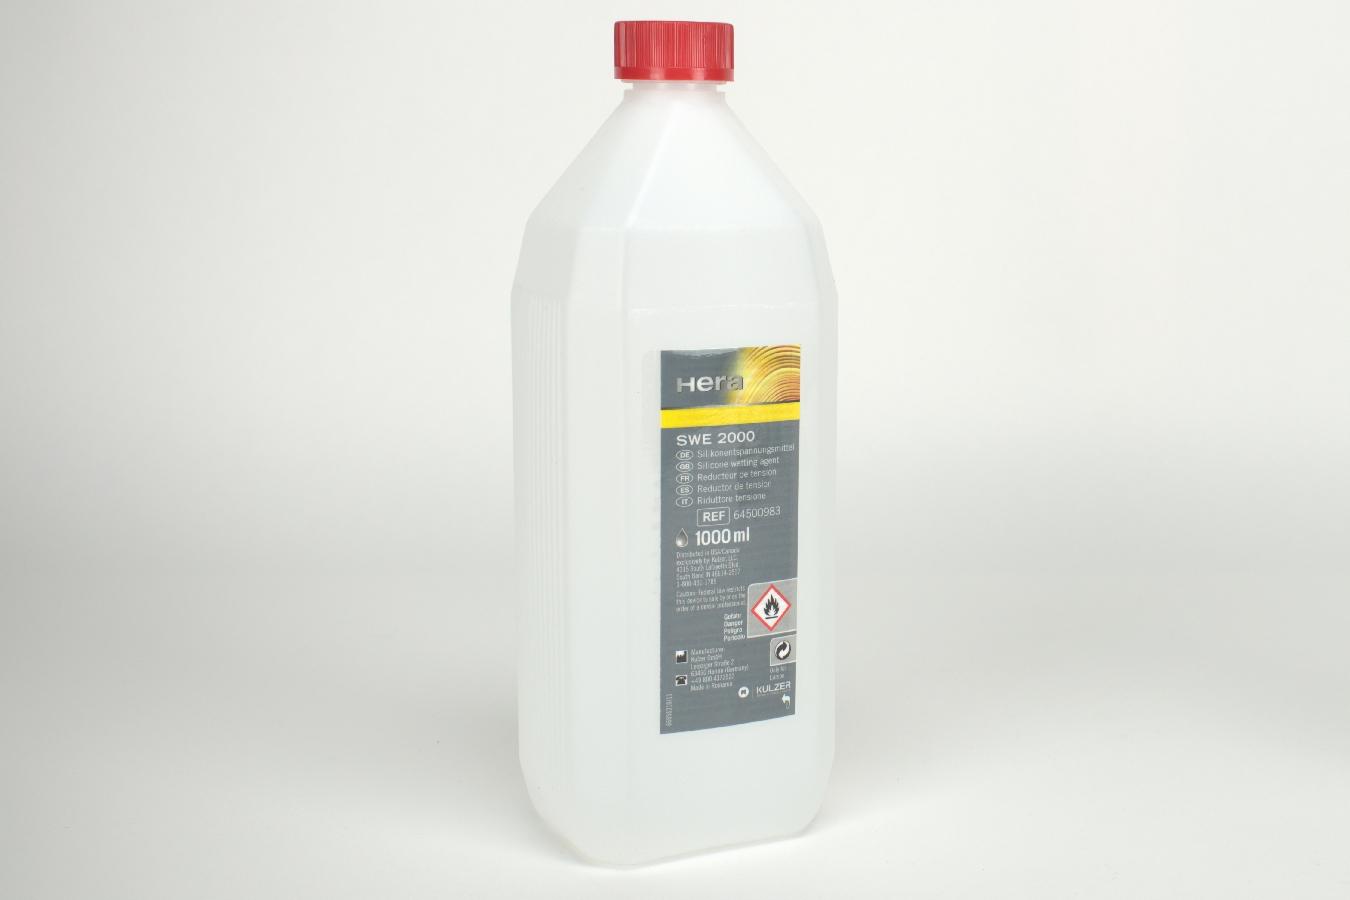 Hera Swe 2000 Silikonentspan. 1L Flasche